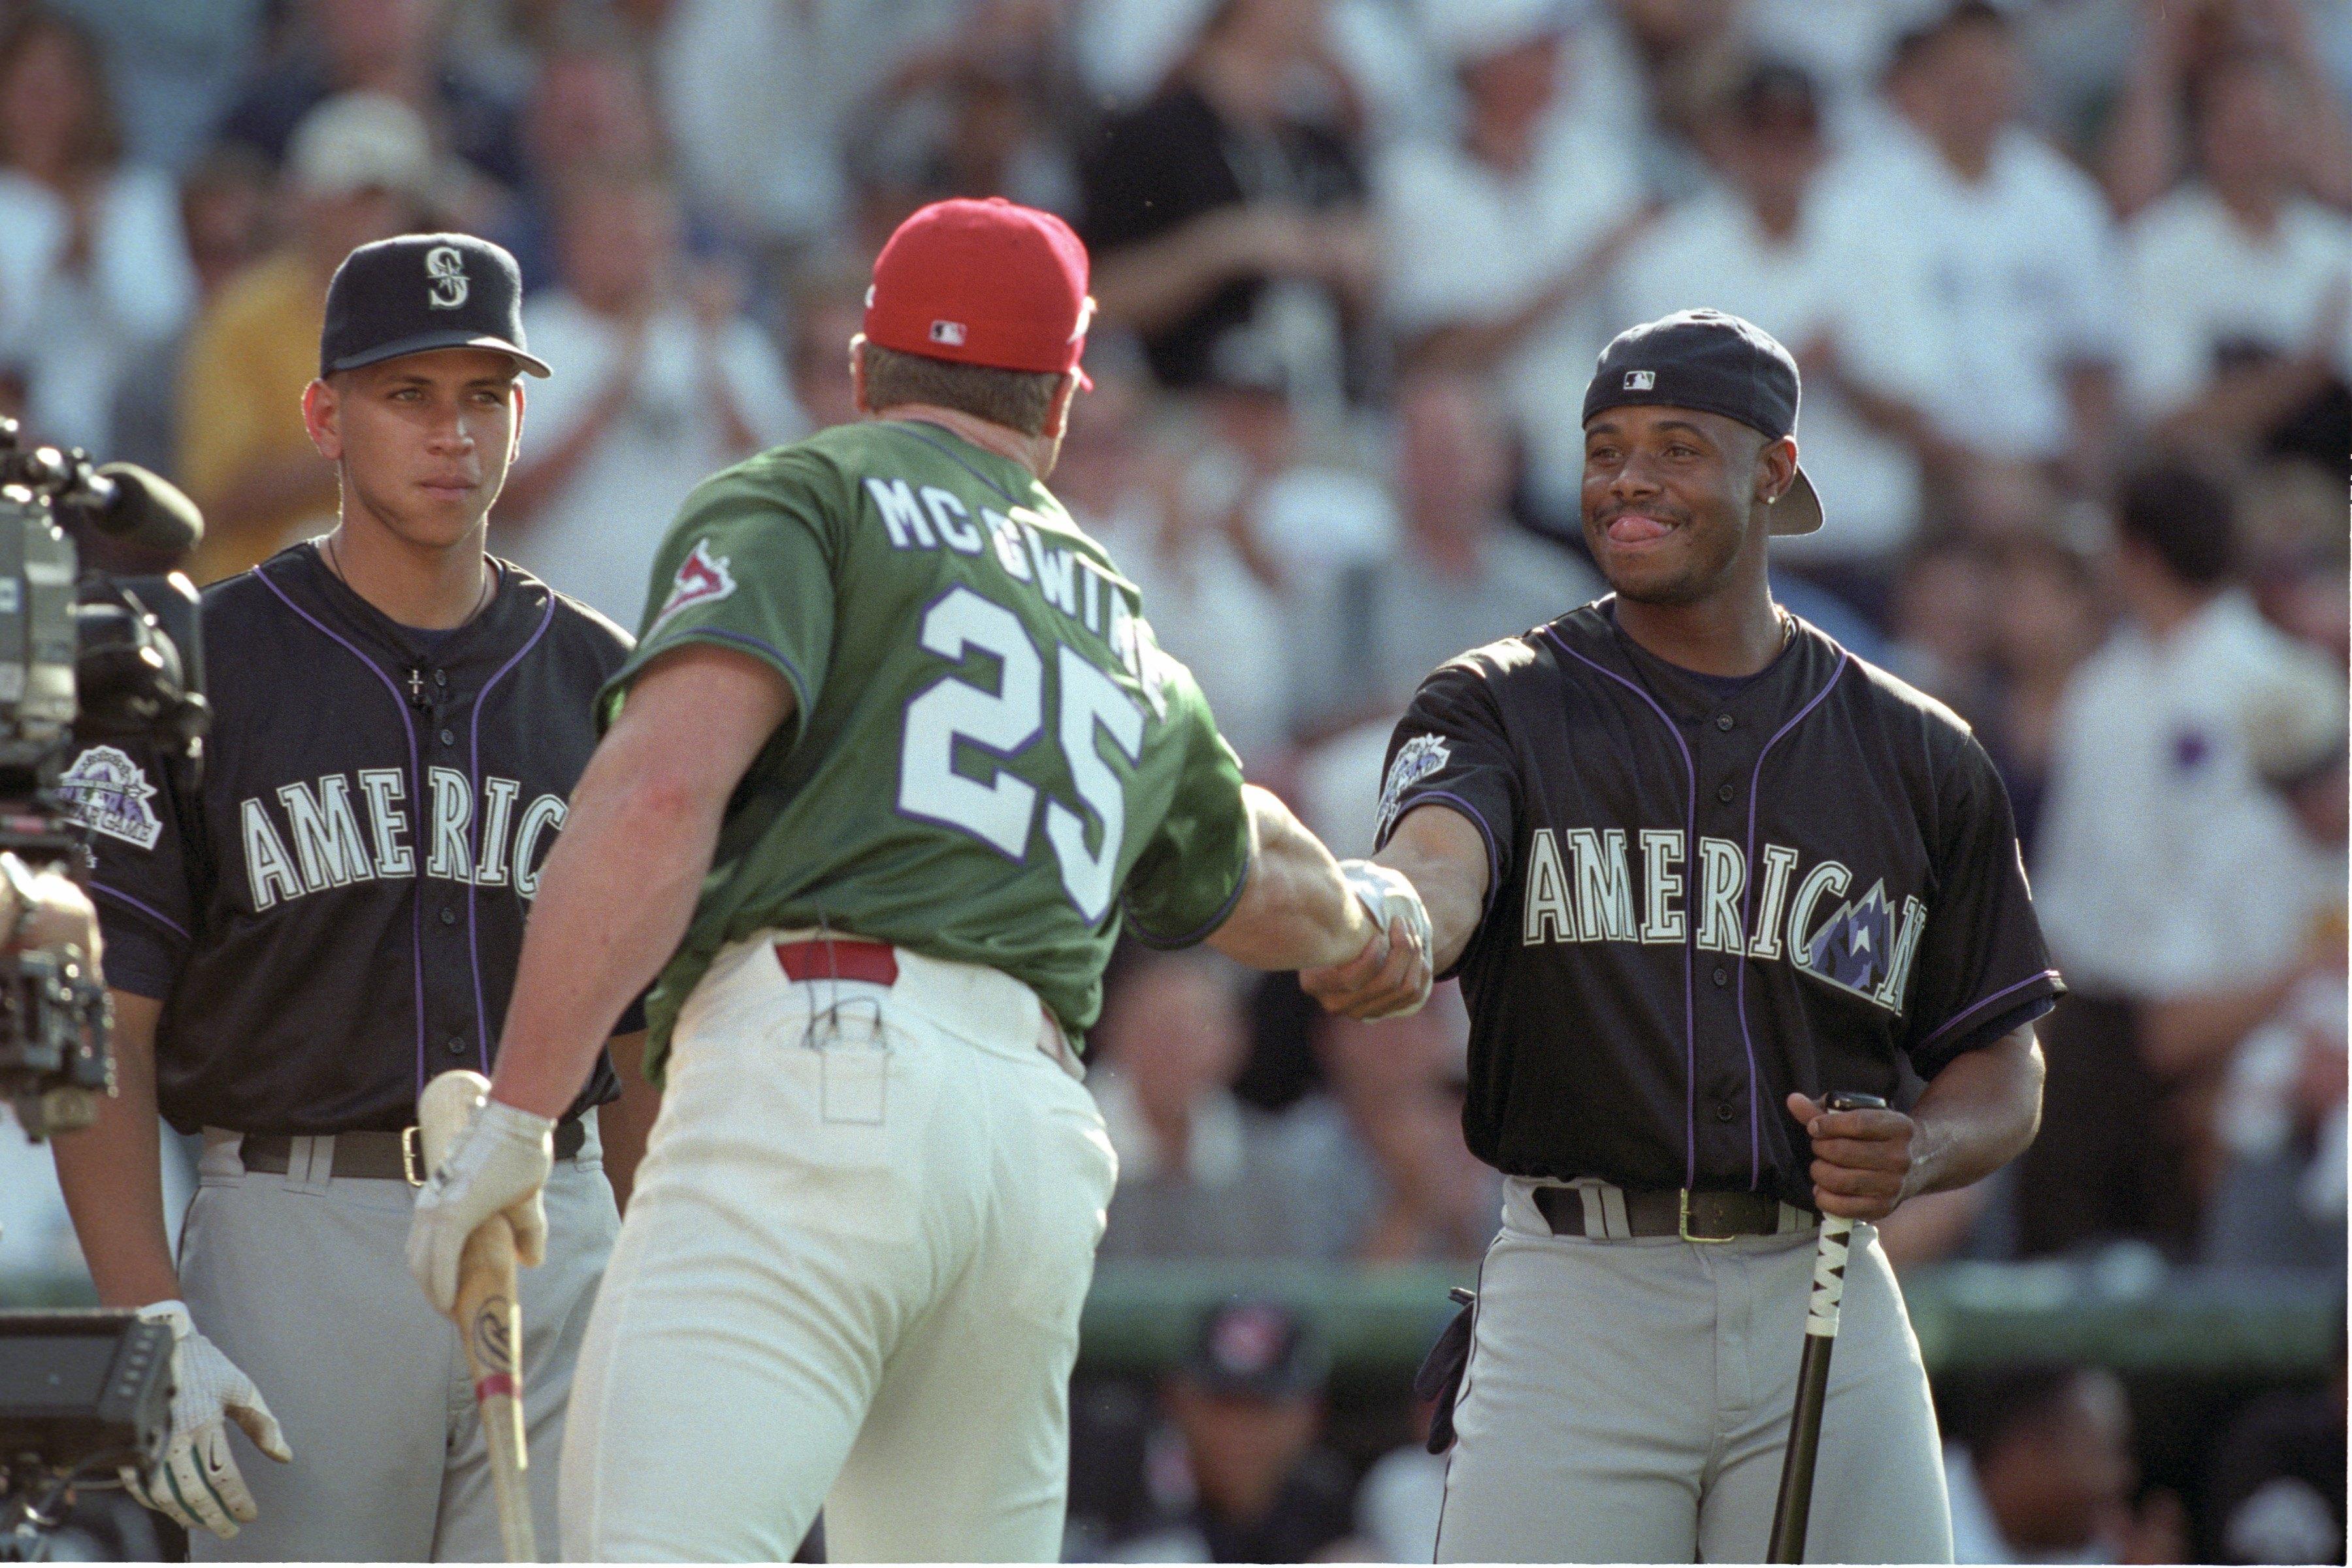 69th MLB All-Star Game Home Run Derby